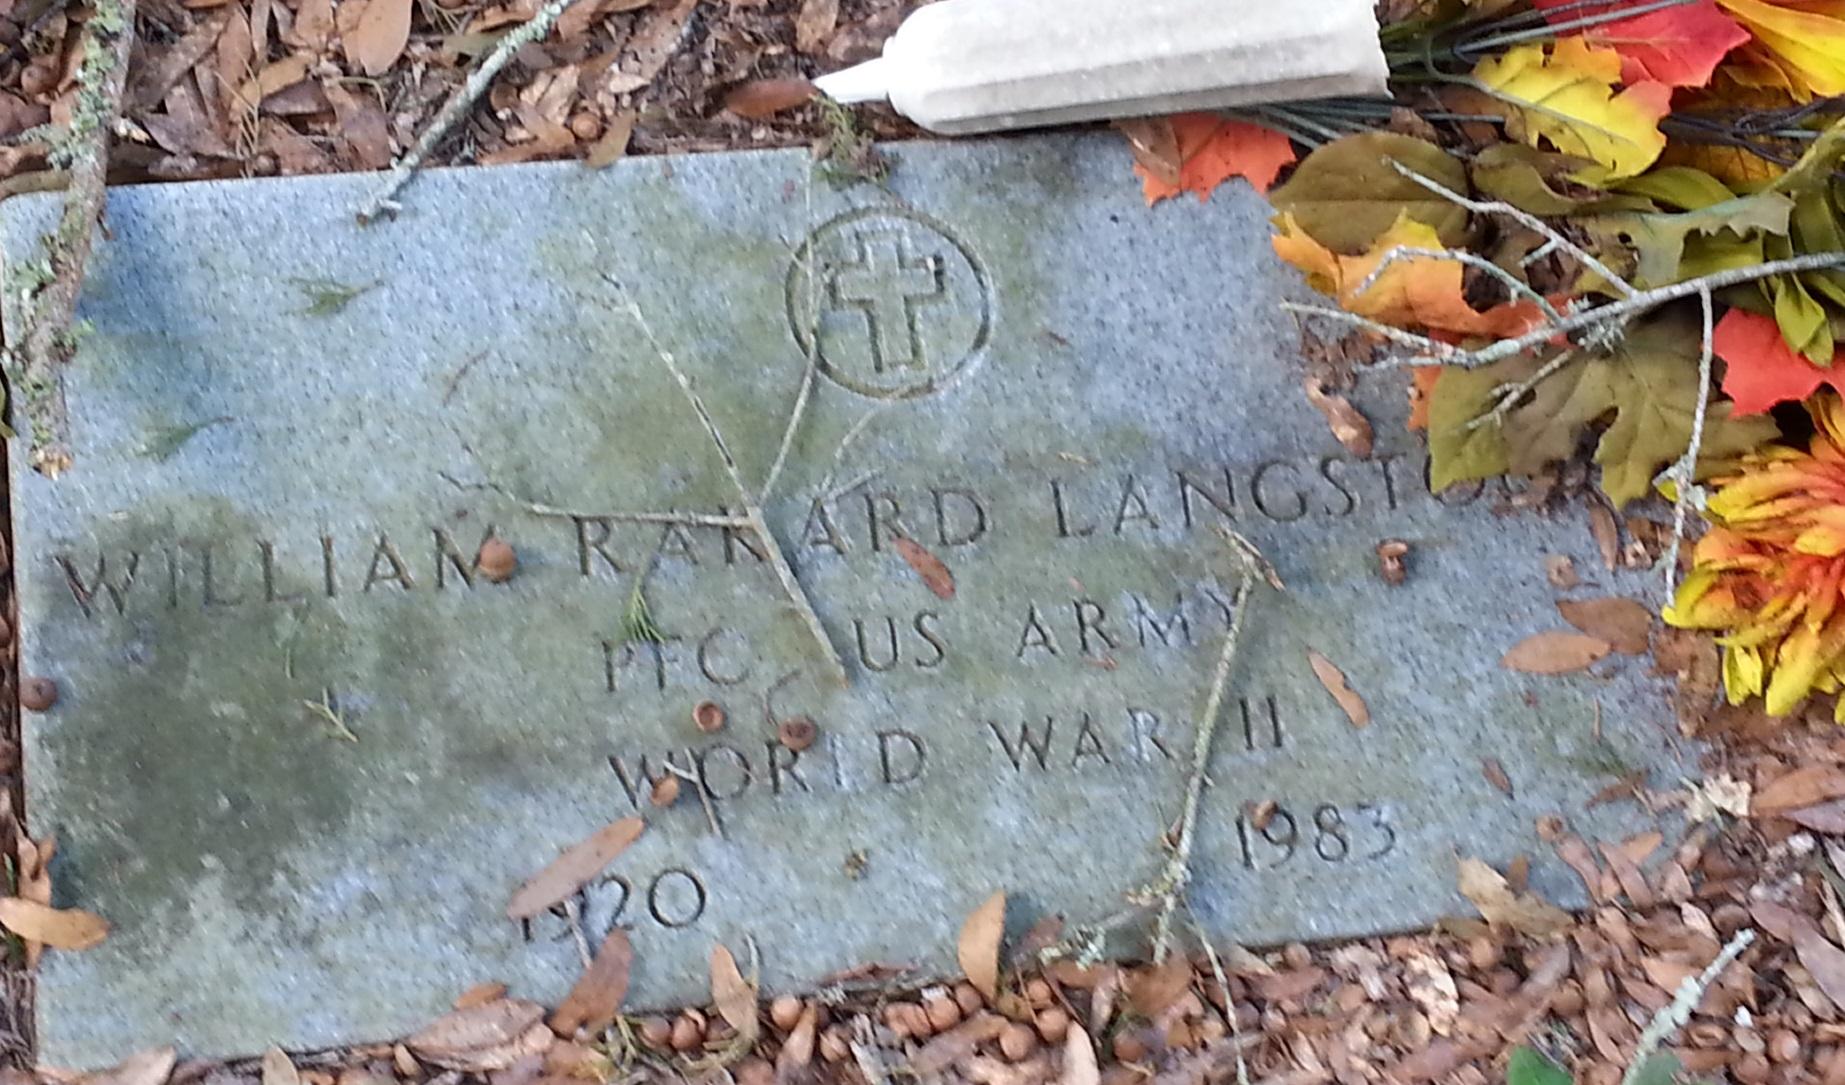 William Raker Langston